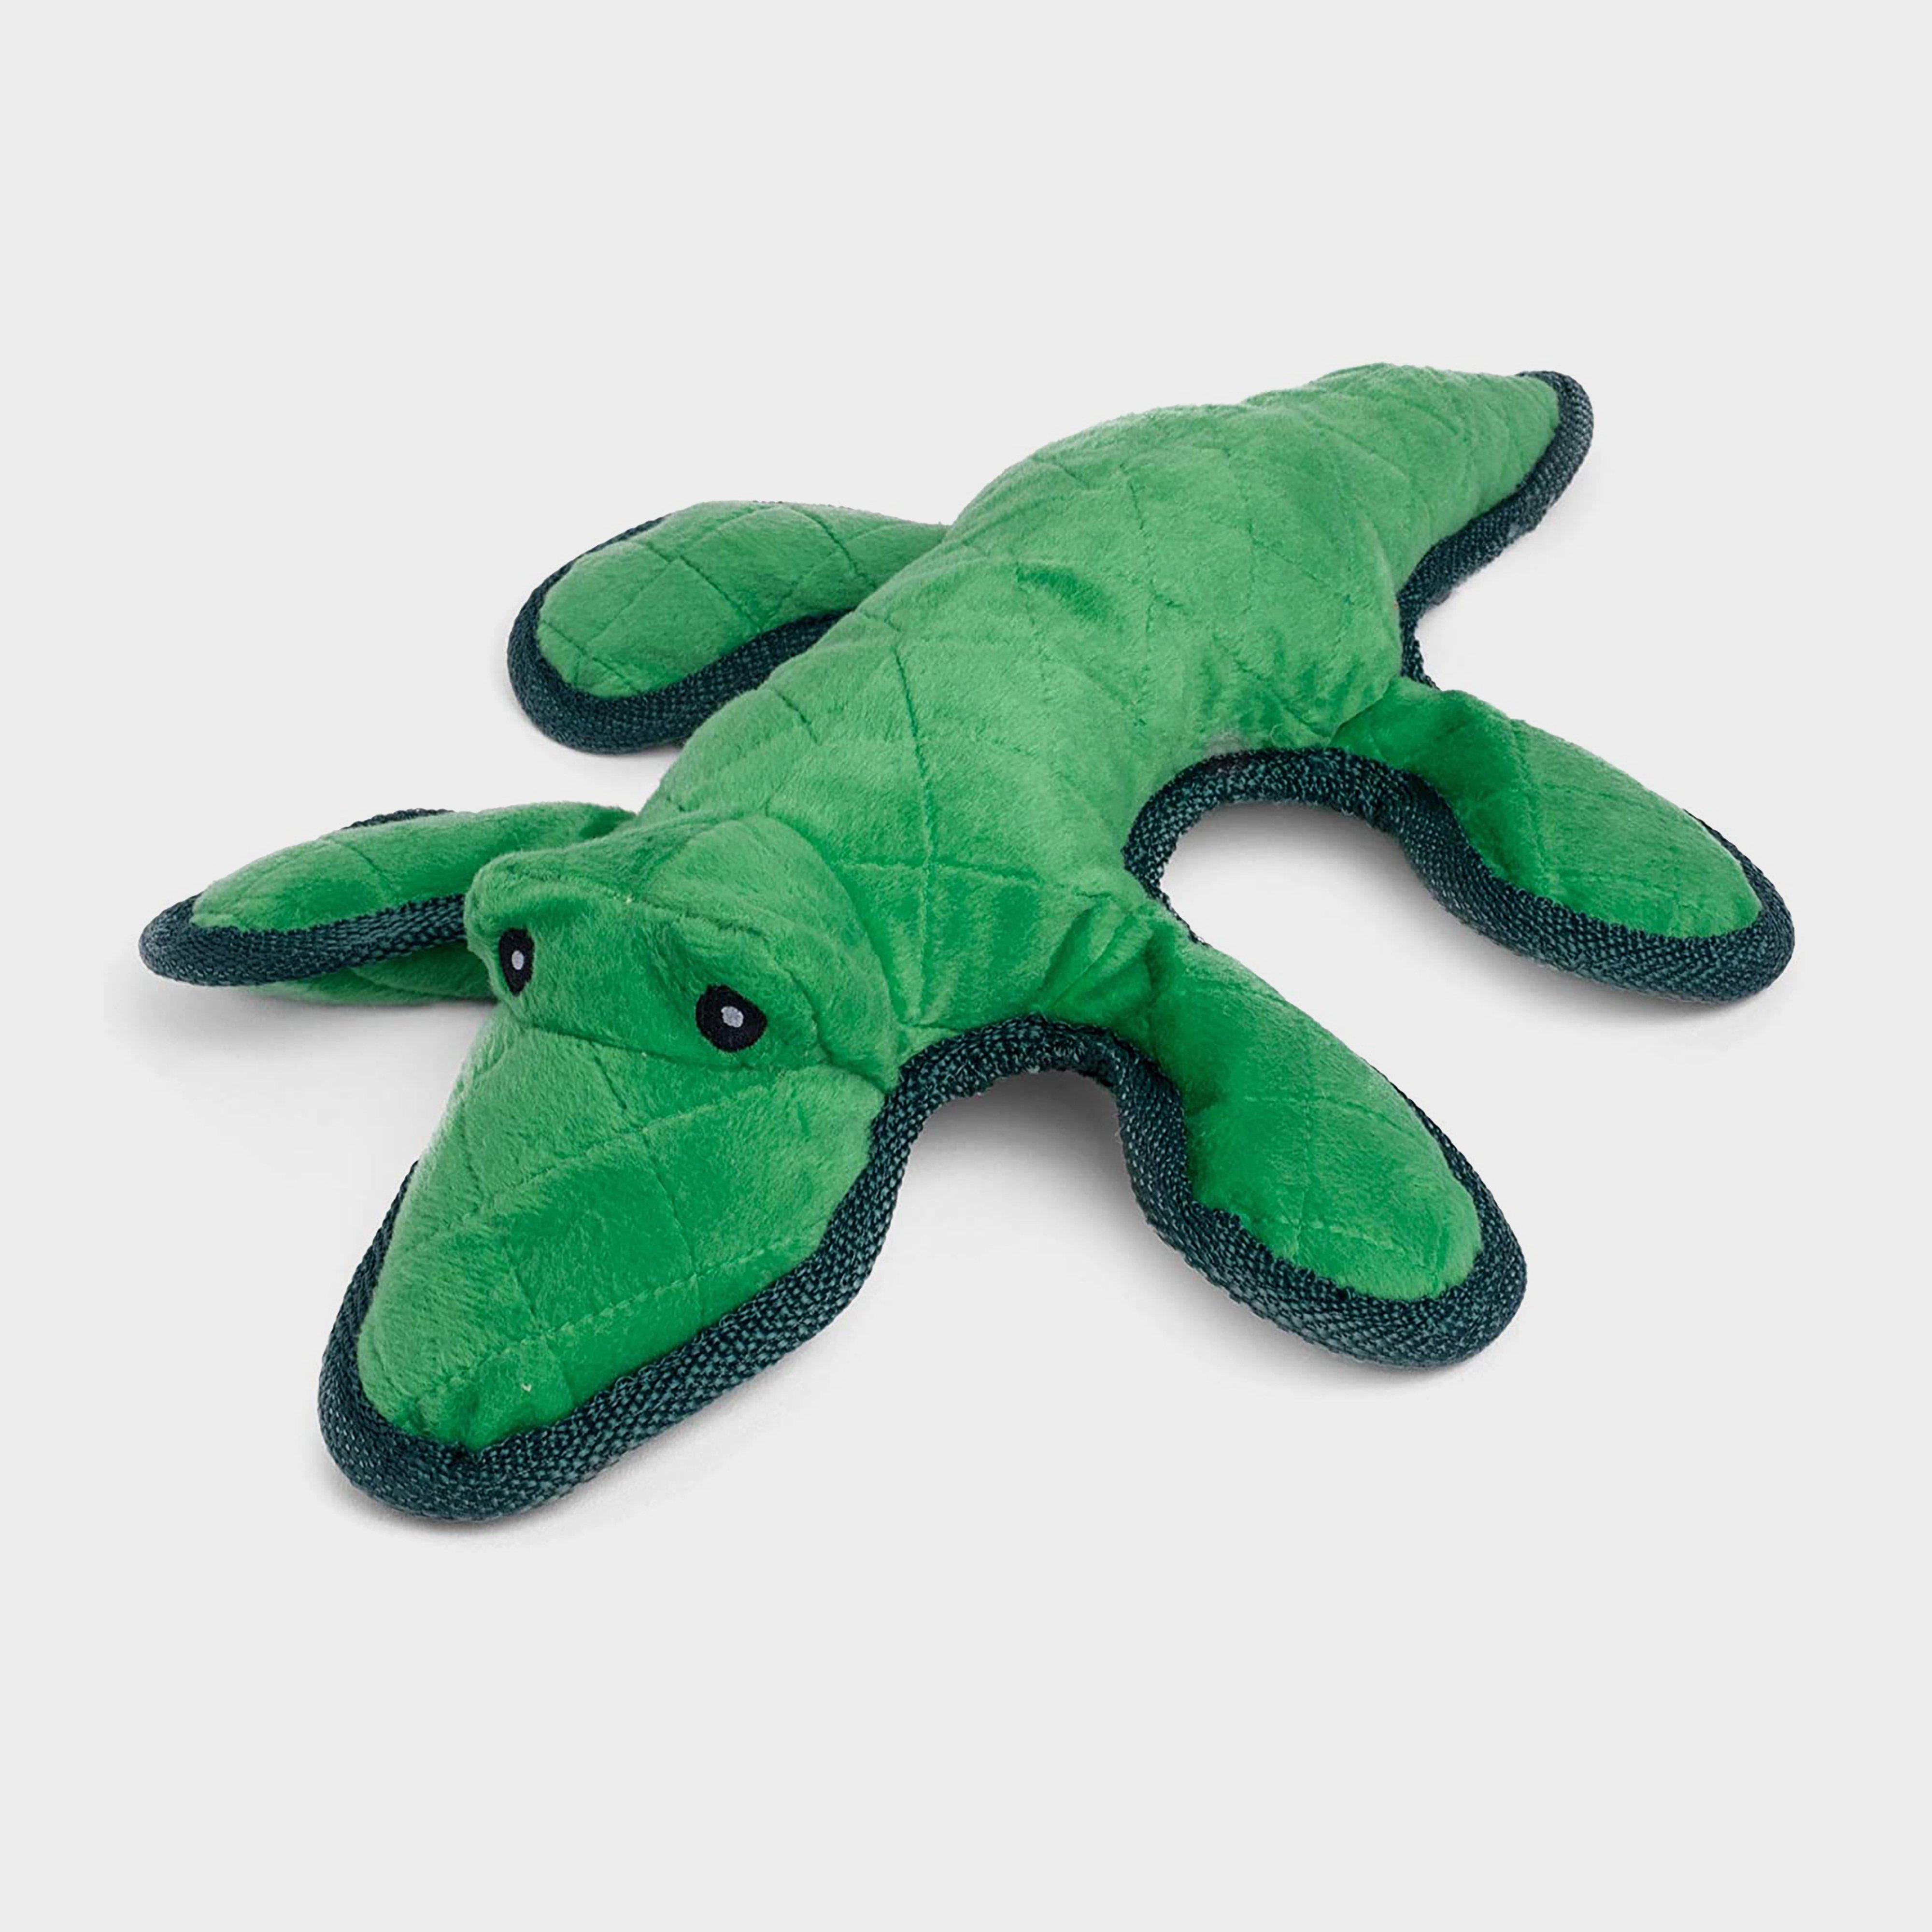 Image of Petface Tough Gator - Green/Green, GREEN/GREEN